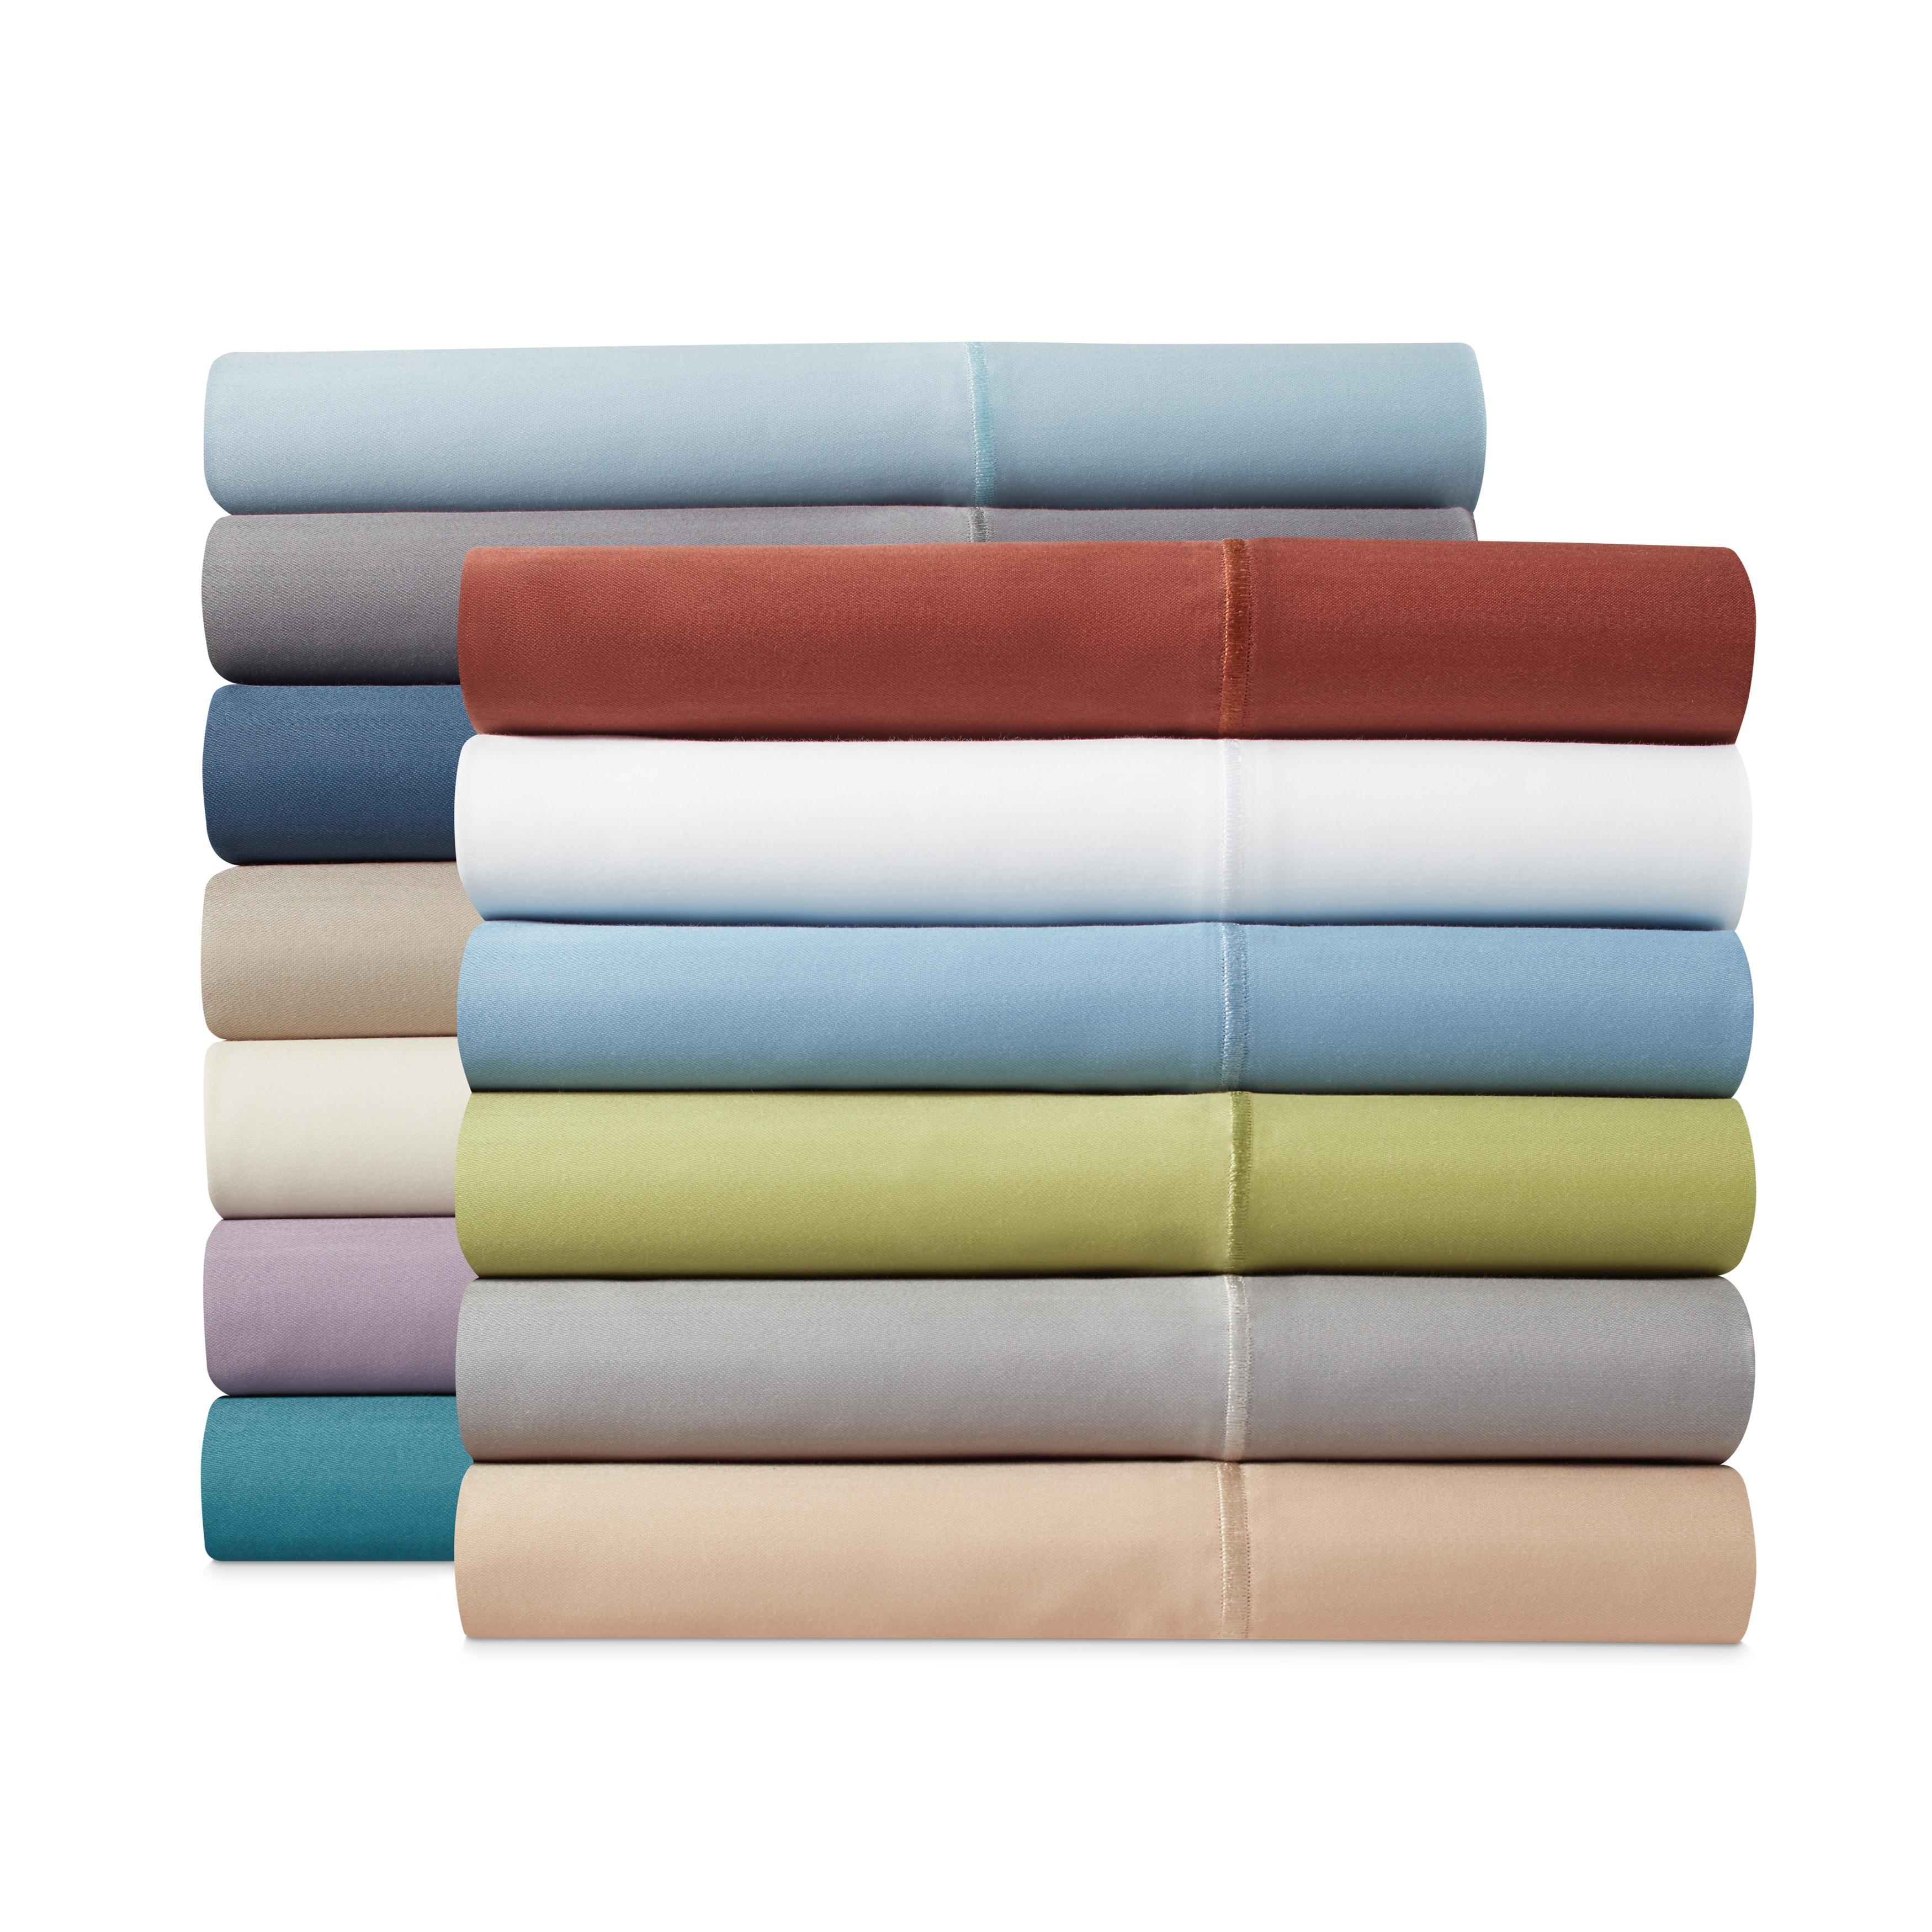 1000 TC Deep Pocket 4 PC Sheet Set Egyptian Cotton All Sizes Moss Striped